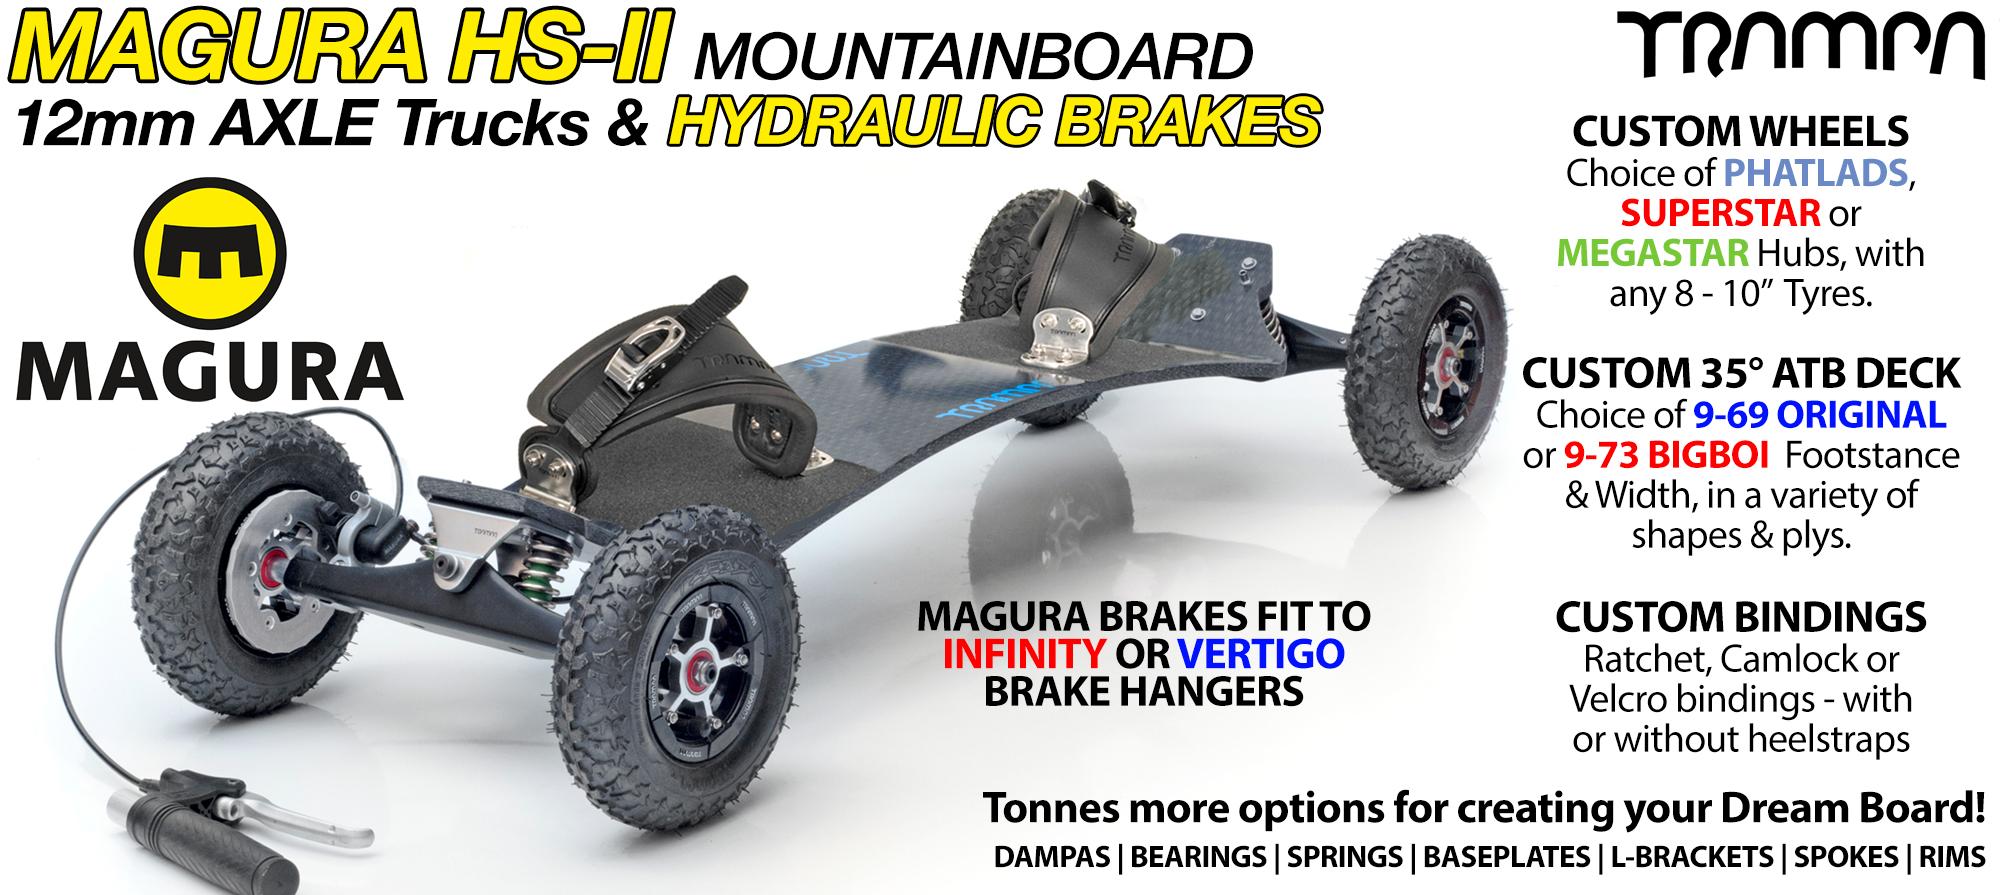 35° TRAMPA BrakeBoard Using MAGURA Brakes on VERTIGO Trucks SUPERSTAR wheels